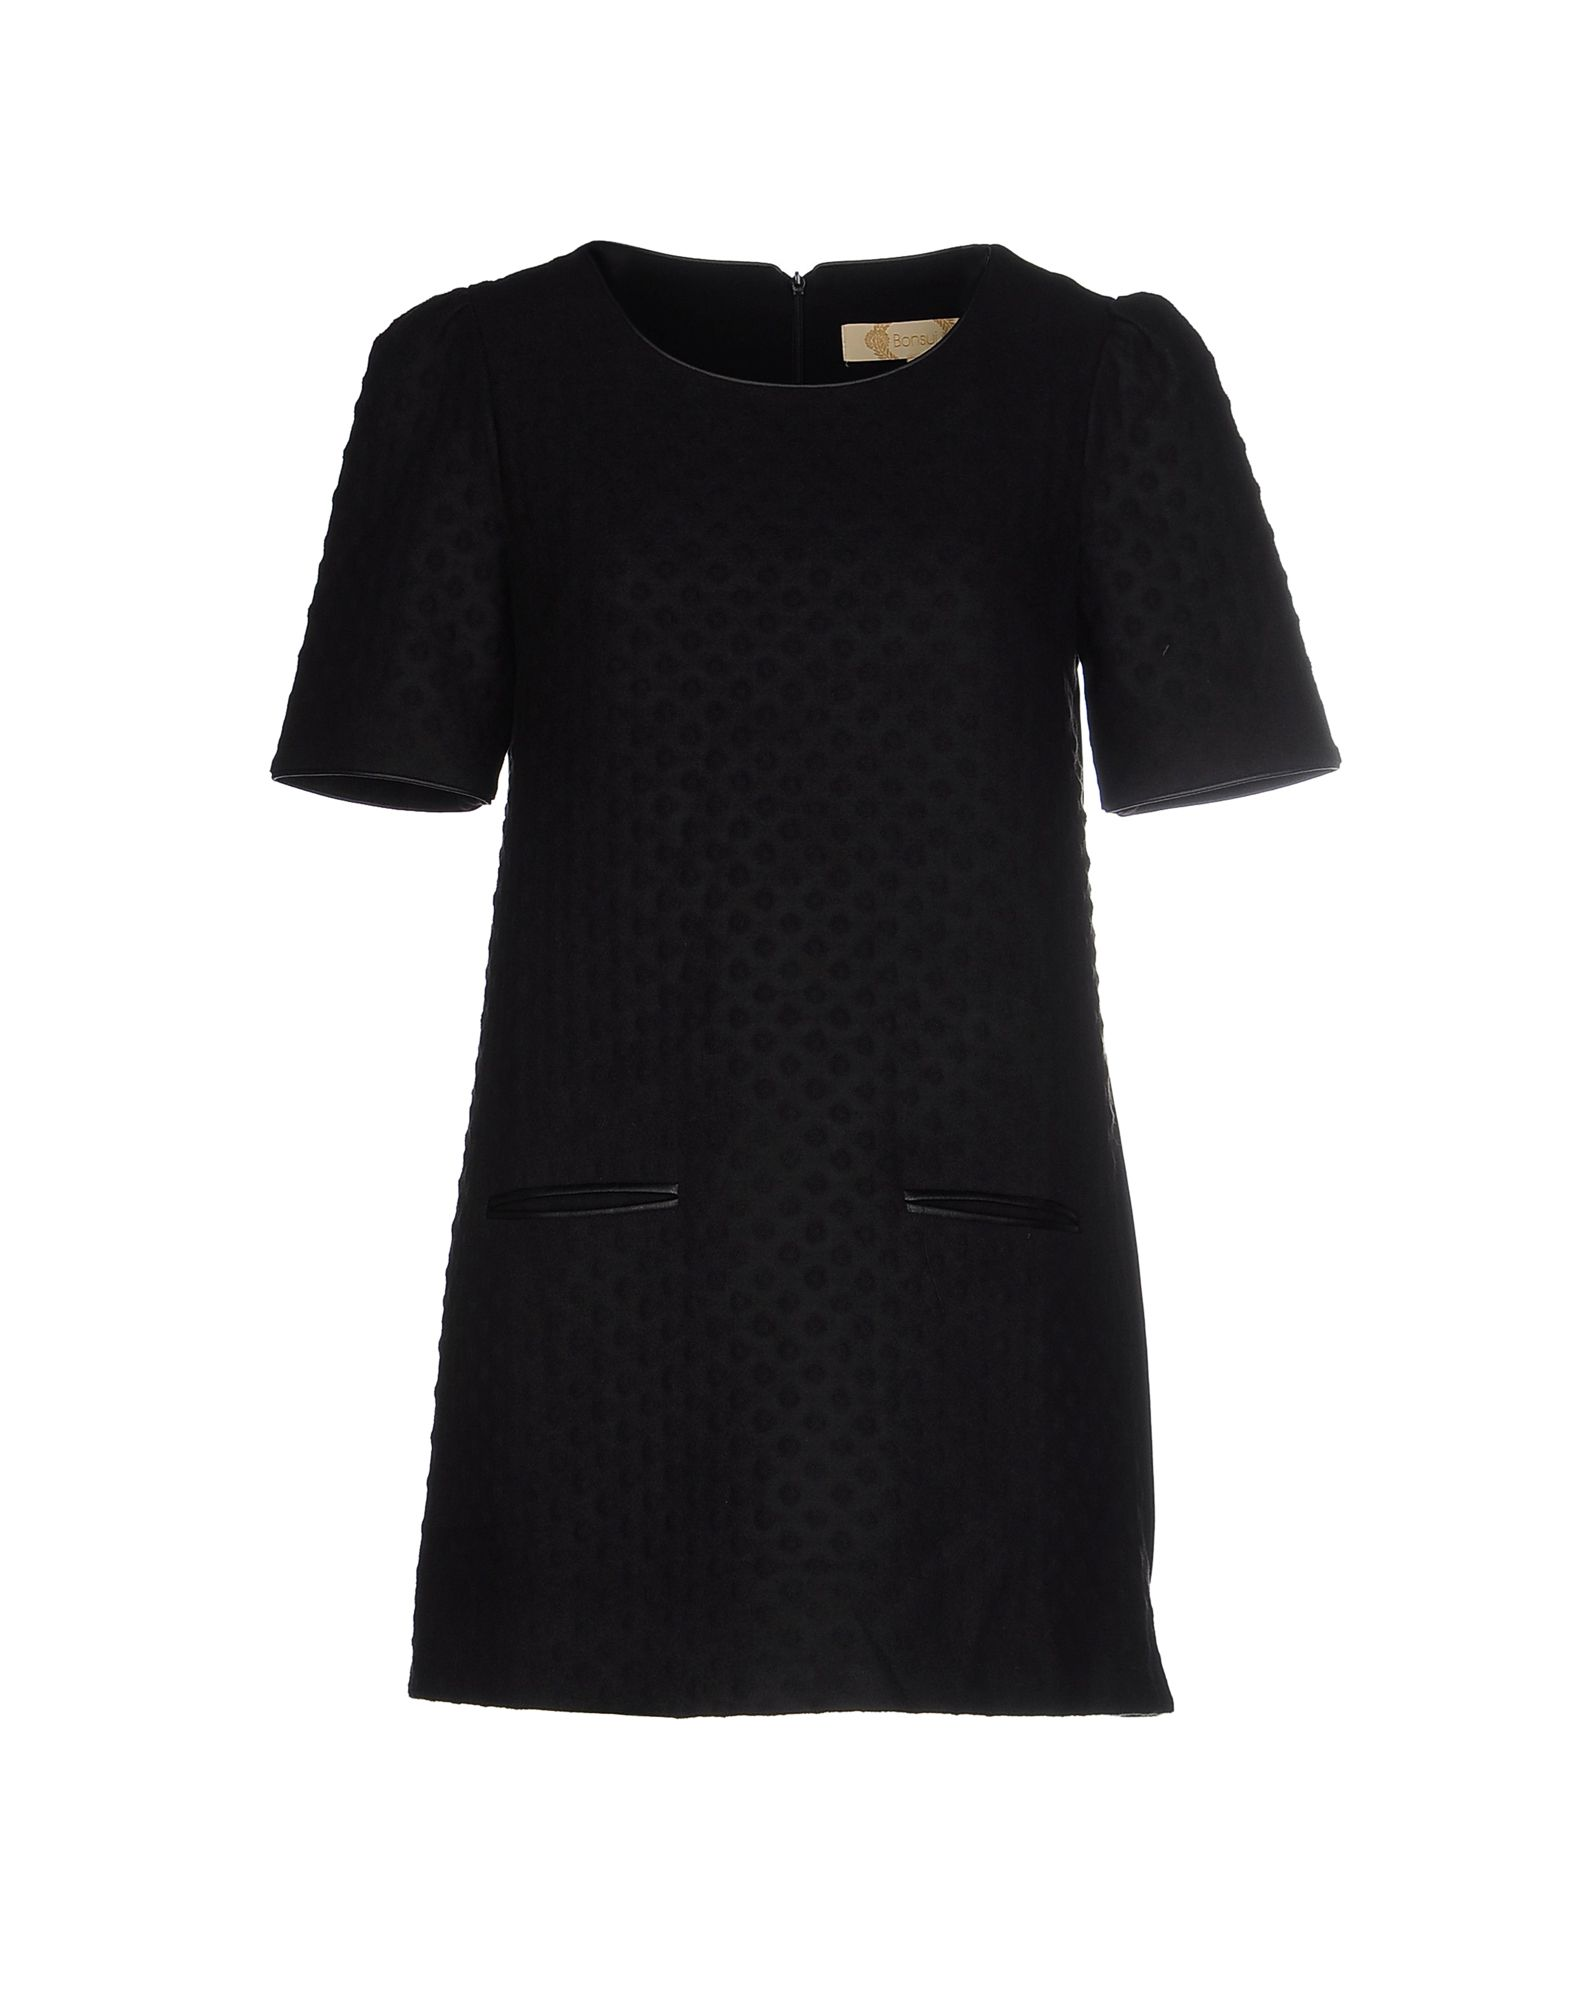 BONSUI Short Dress in Black